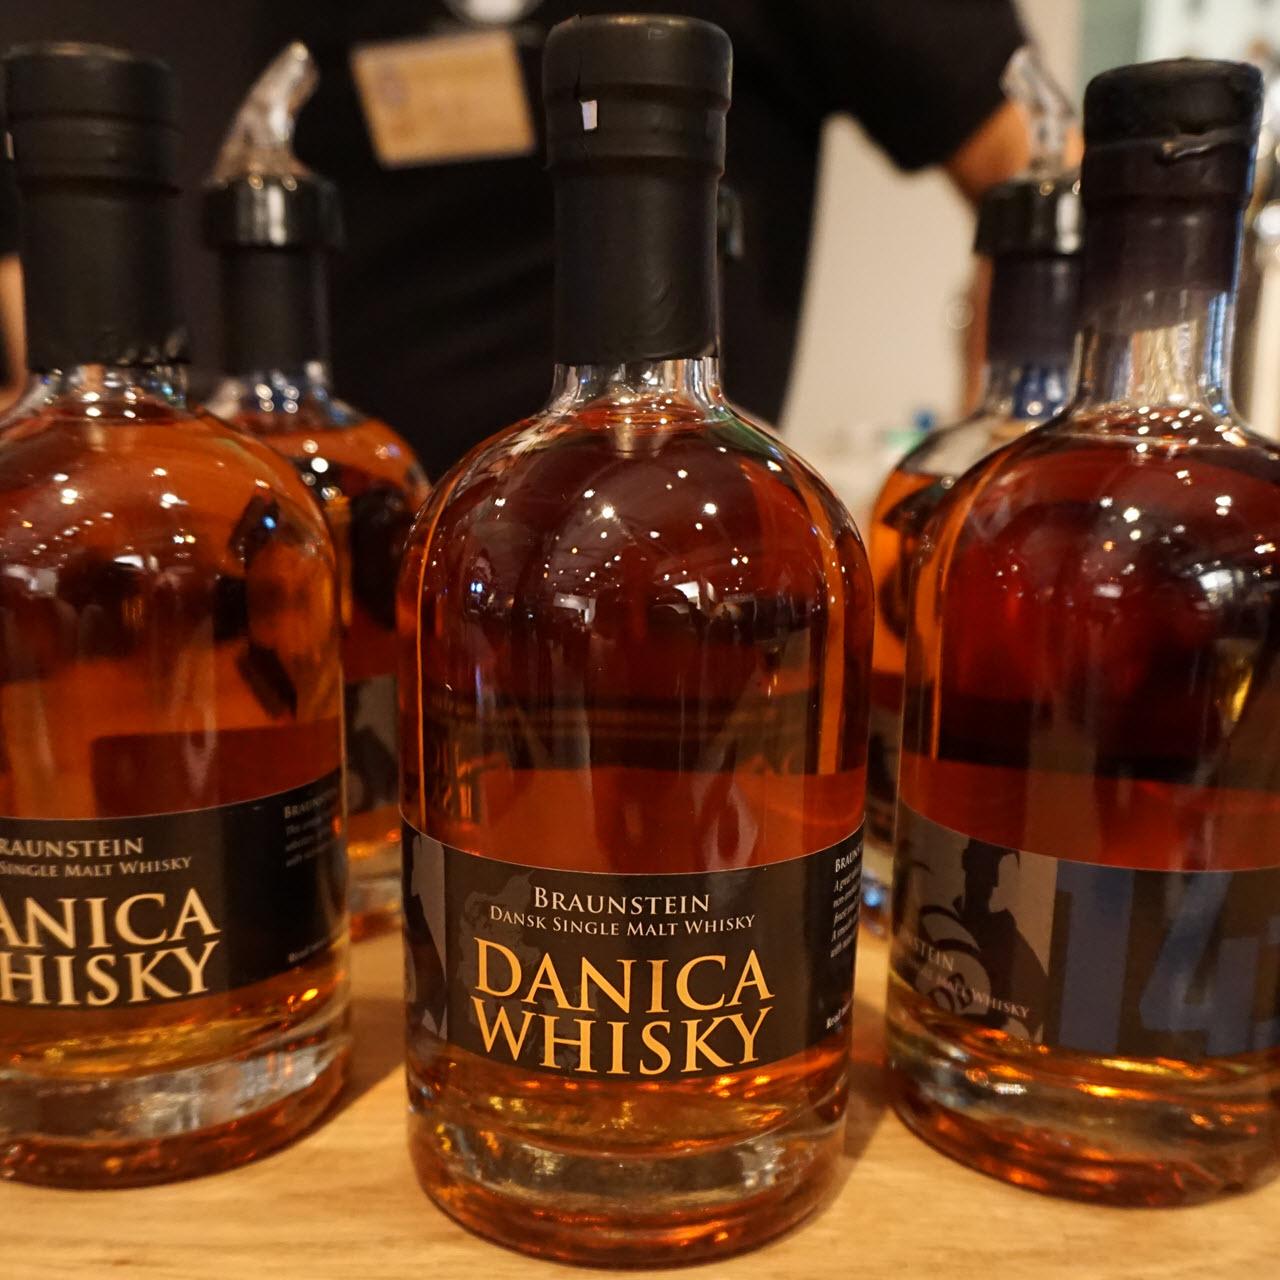 Nordic Whisky #25 - Braunstein Danica Whisky